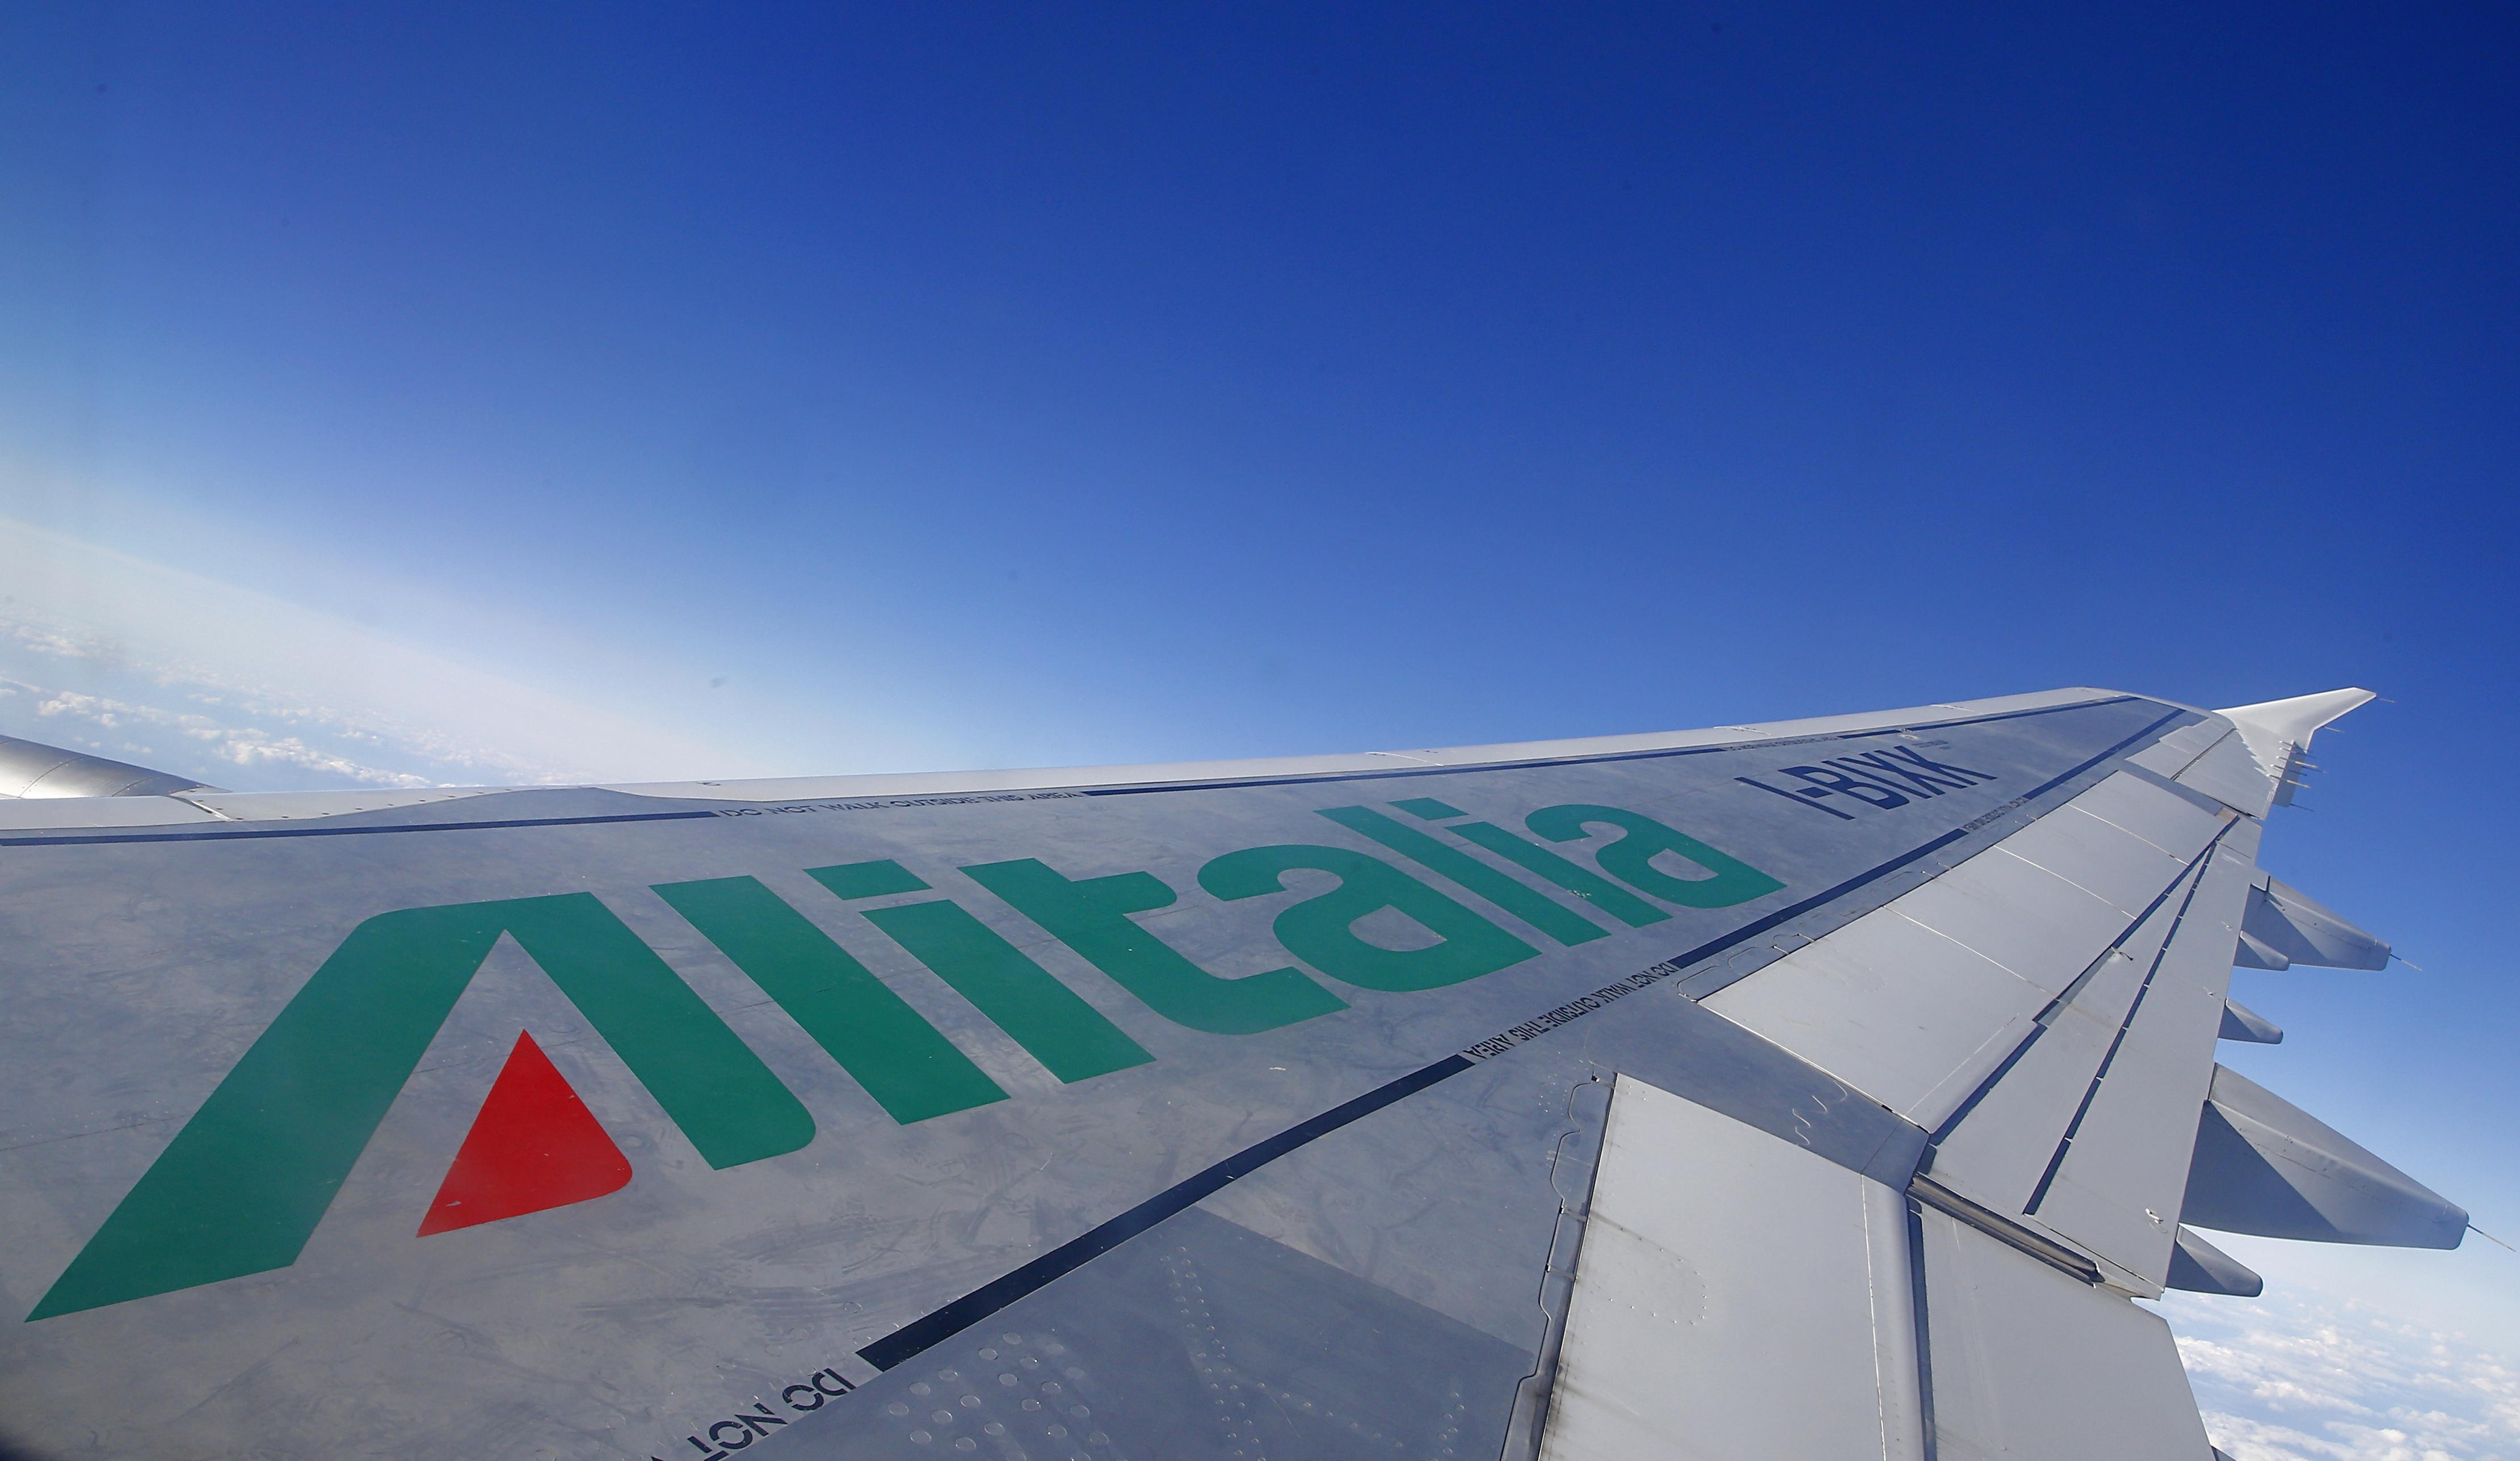 ITALY-AIRLINE-ALITALIA